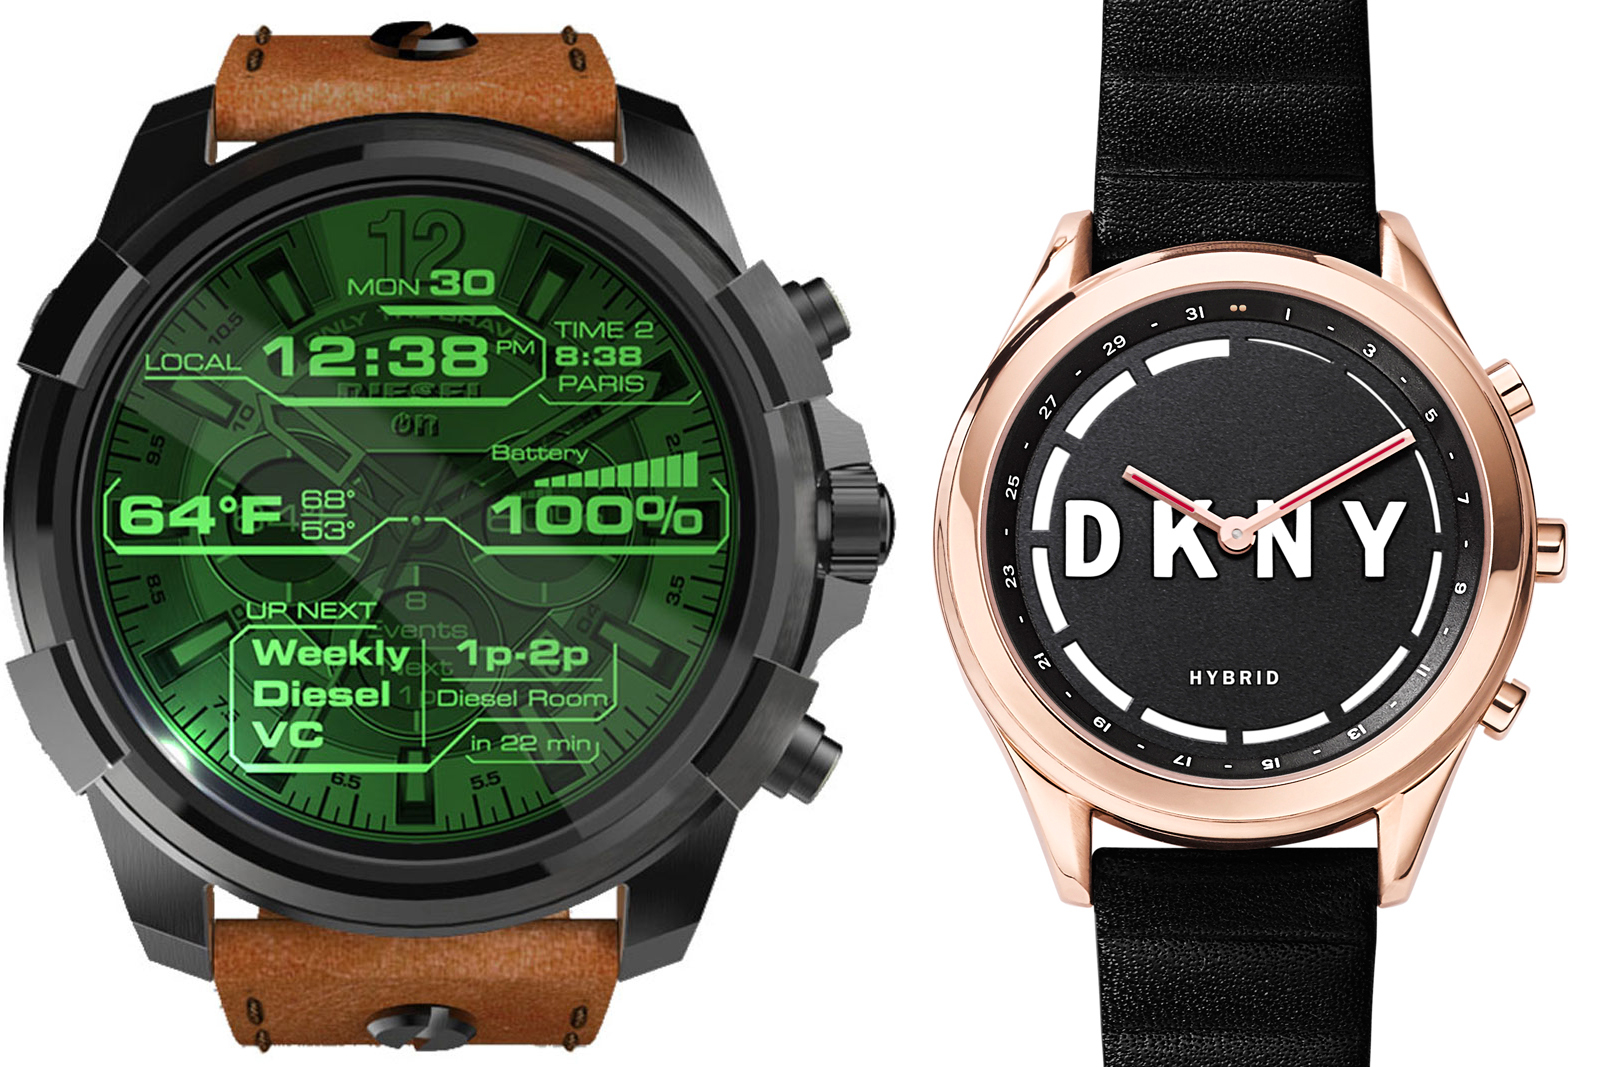 fossil pr voit de lancer 300 variantes de montres android. Black Bedroom Furniture Sets. Home Design Ideas